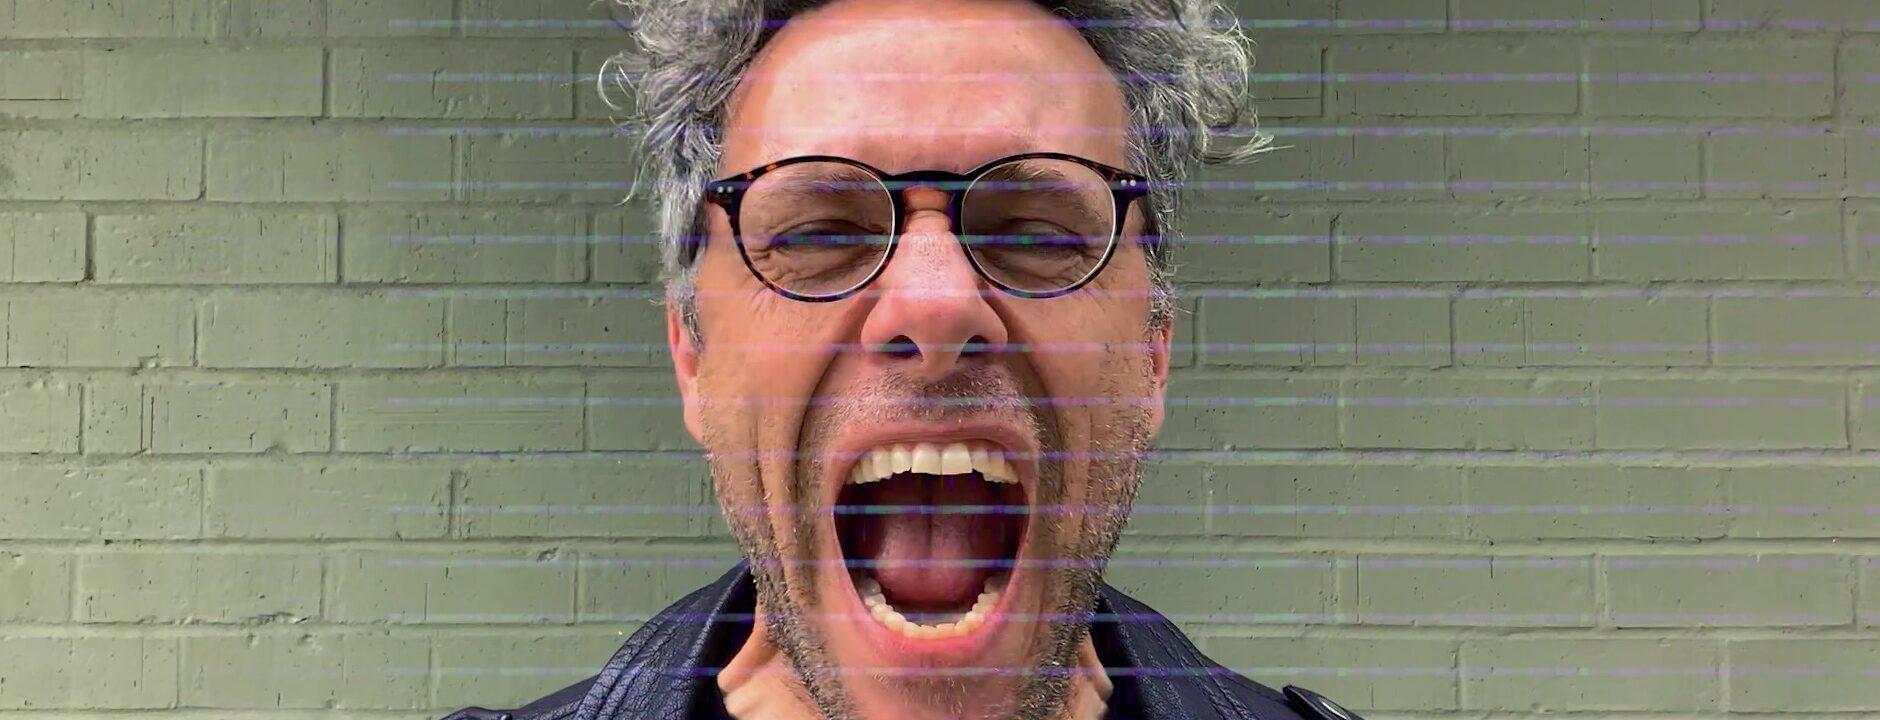 Brad Thompson (angry)